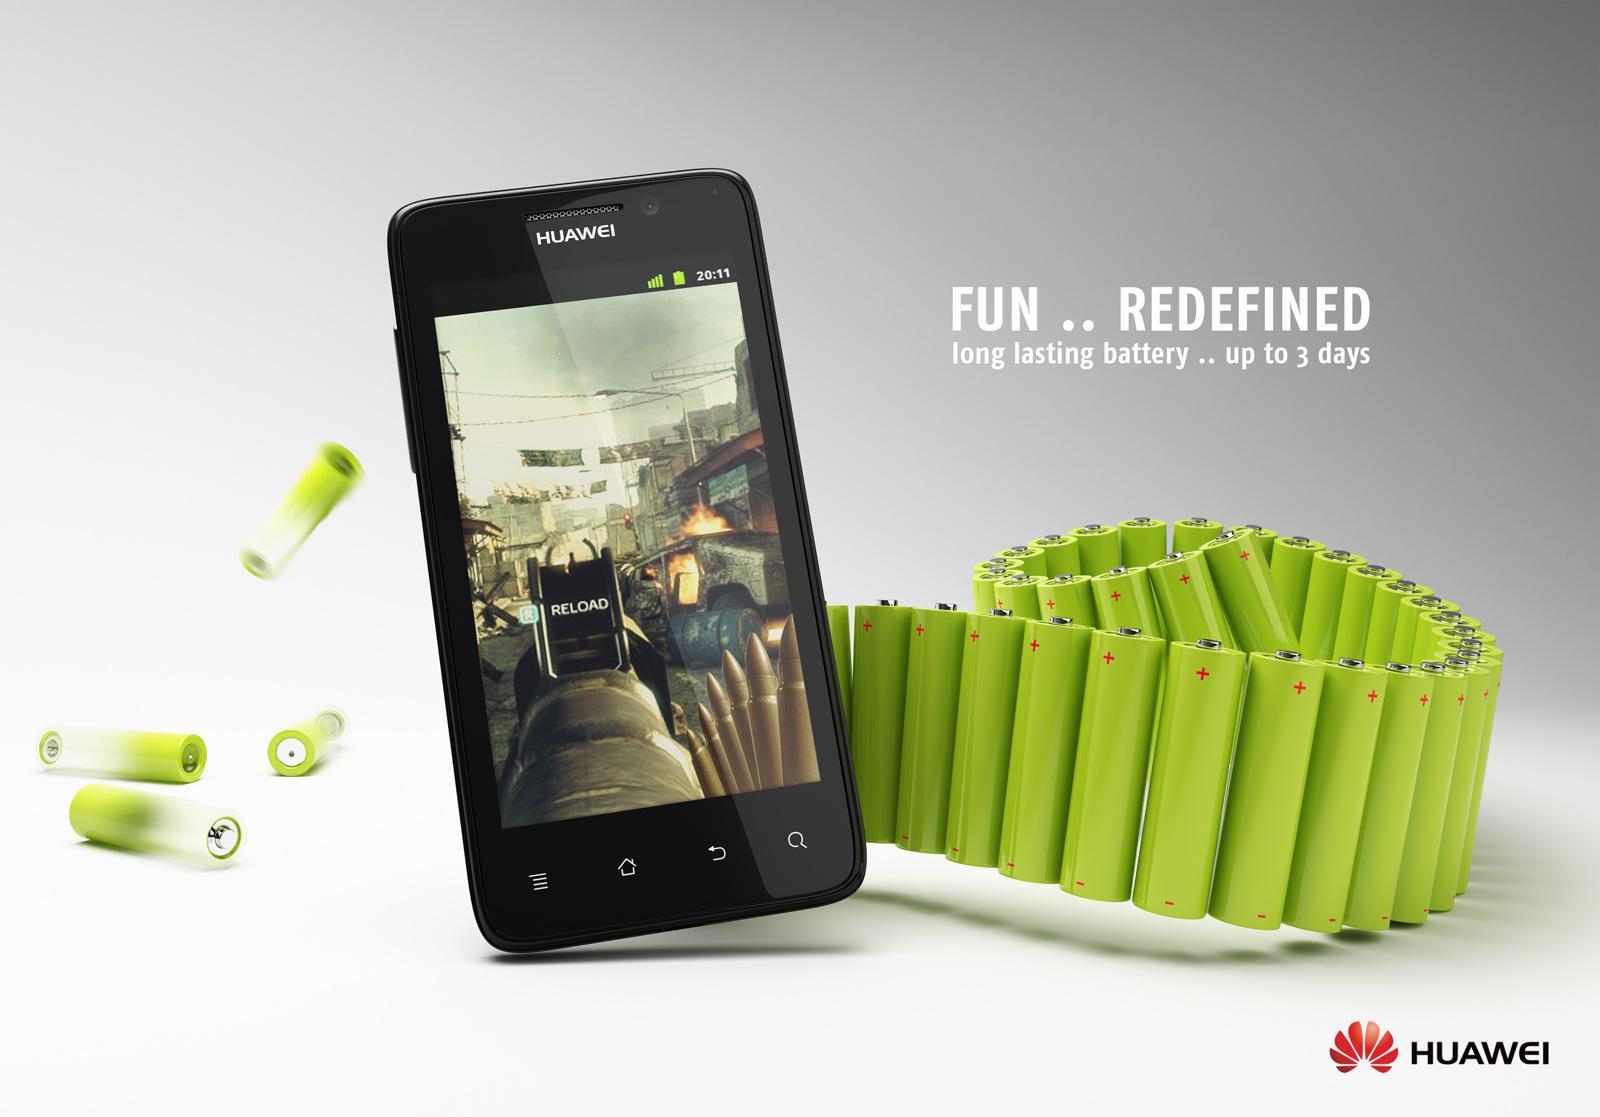 Huawei Print Ad -  Fun redefined